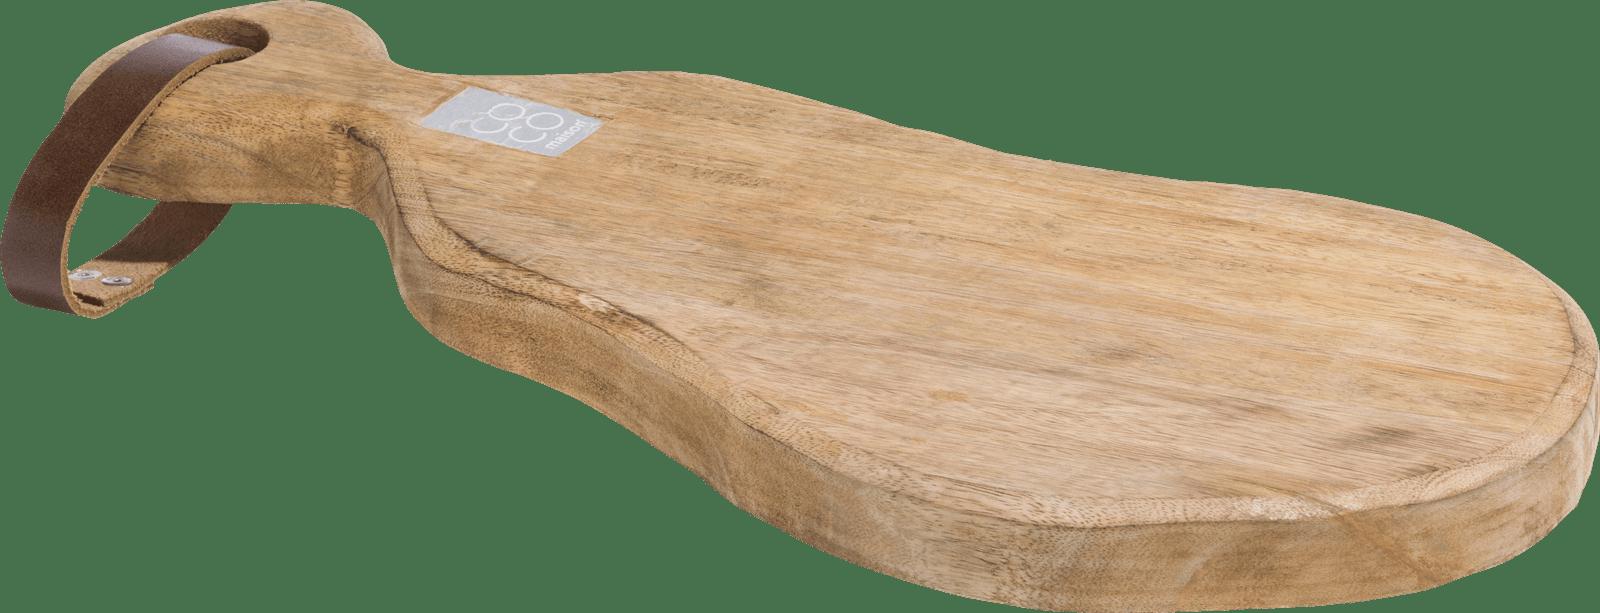 XOOON - Coco Maison - mandra chopping board 30x51cm